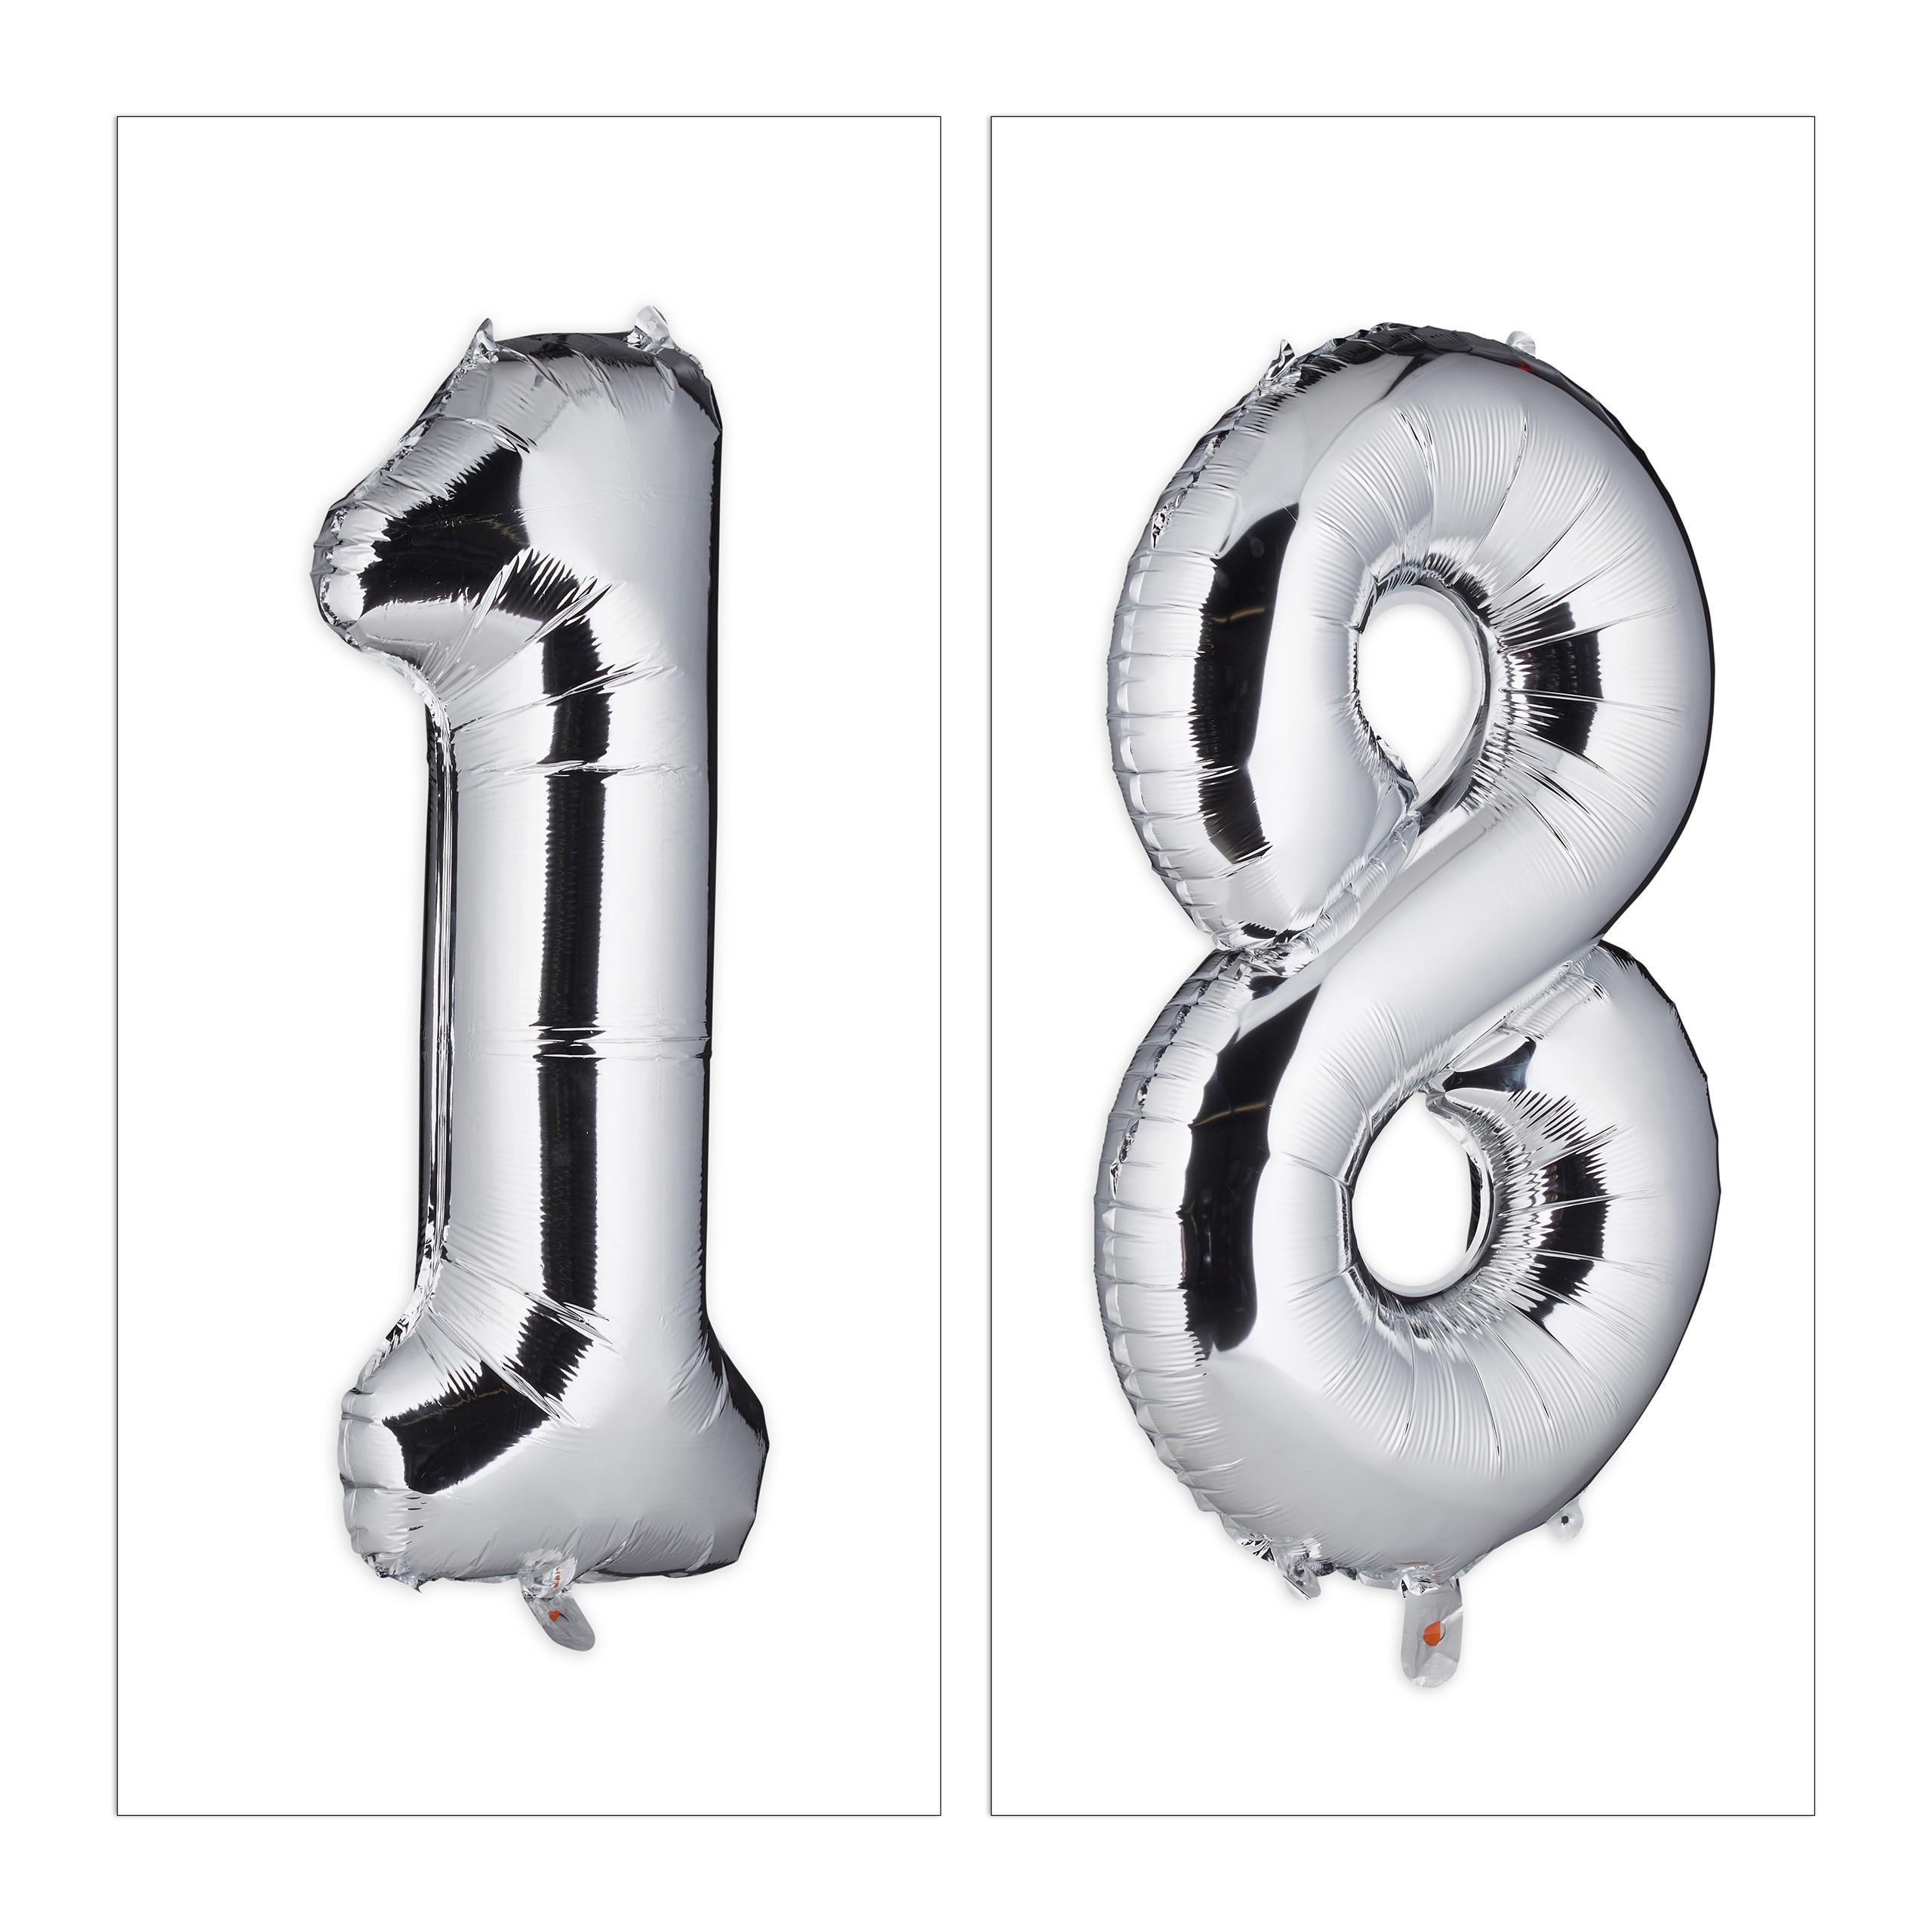 Folienballon 18 Zahlen Luftballon 18er-Ballons Riesenluftballon Helium Balloon